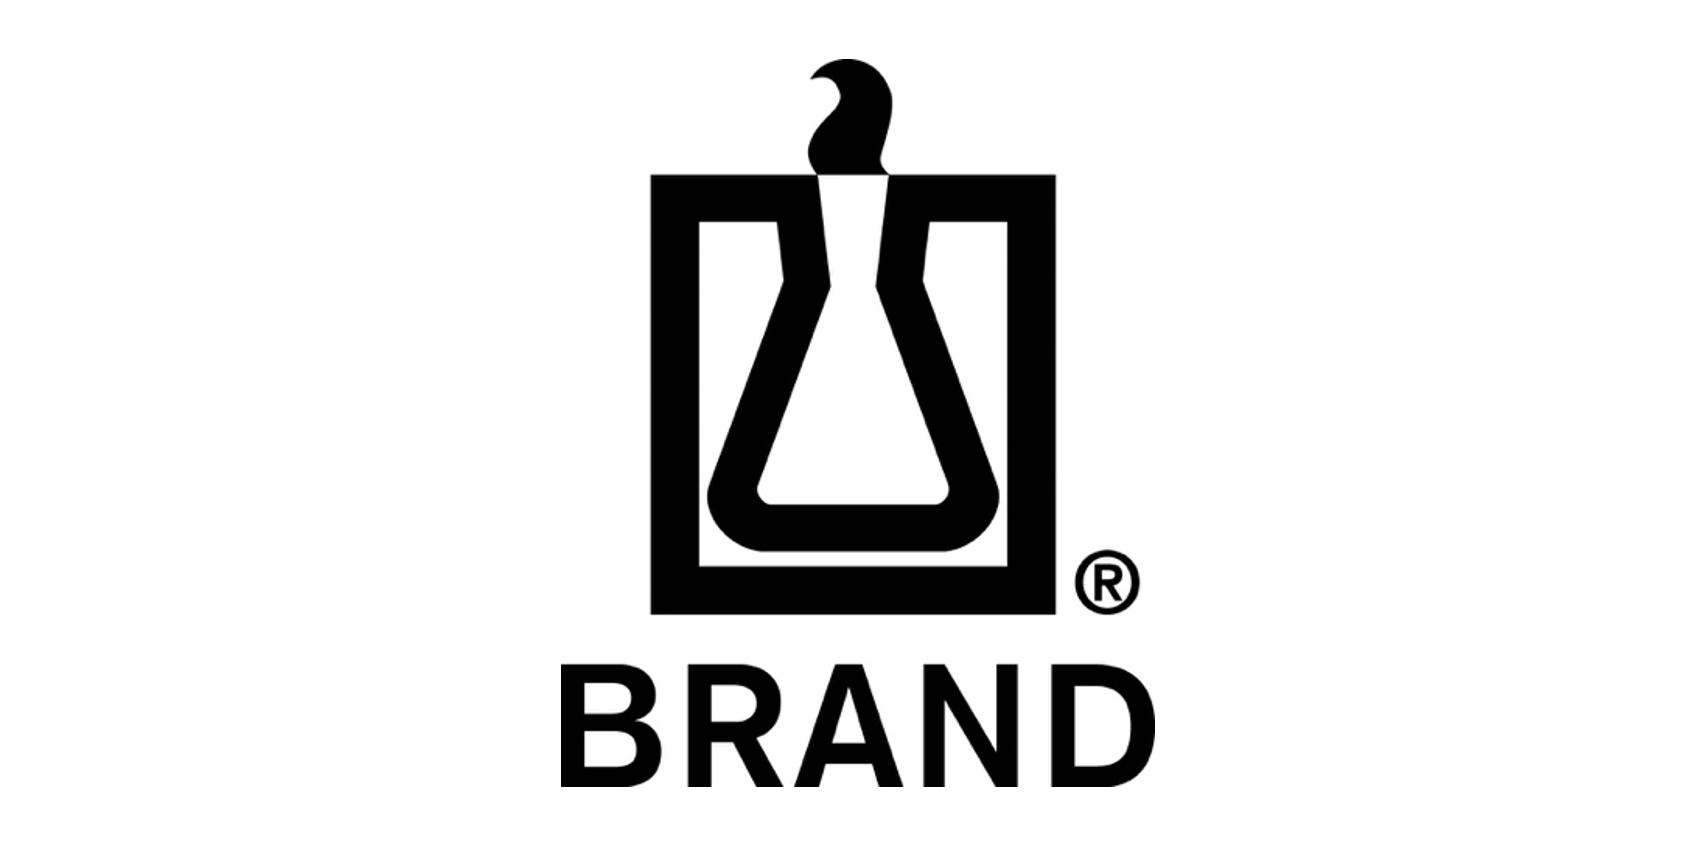 Brand gmbh